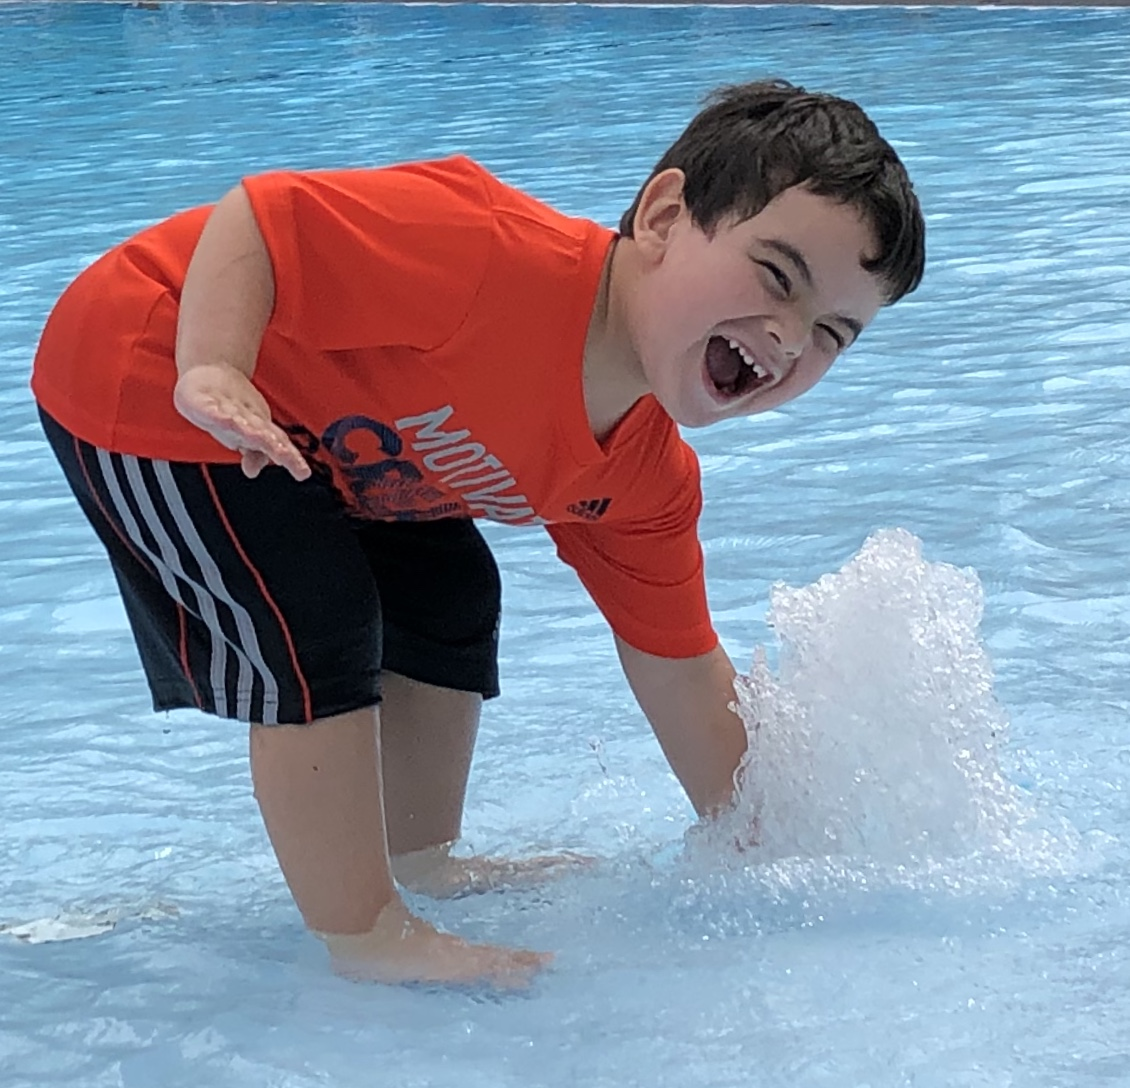 Kid feeling the water